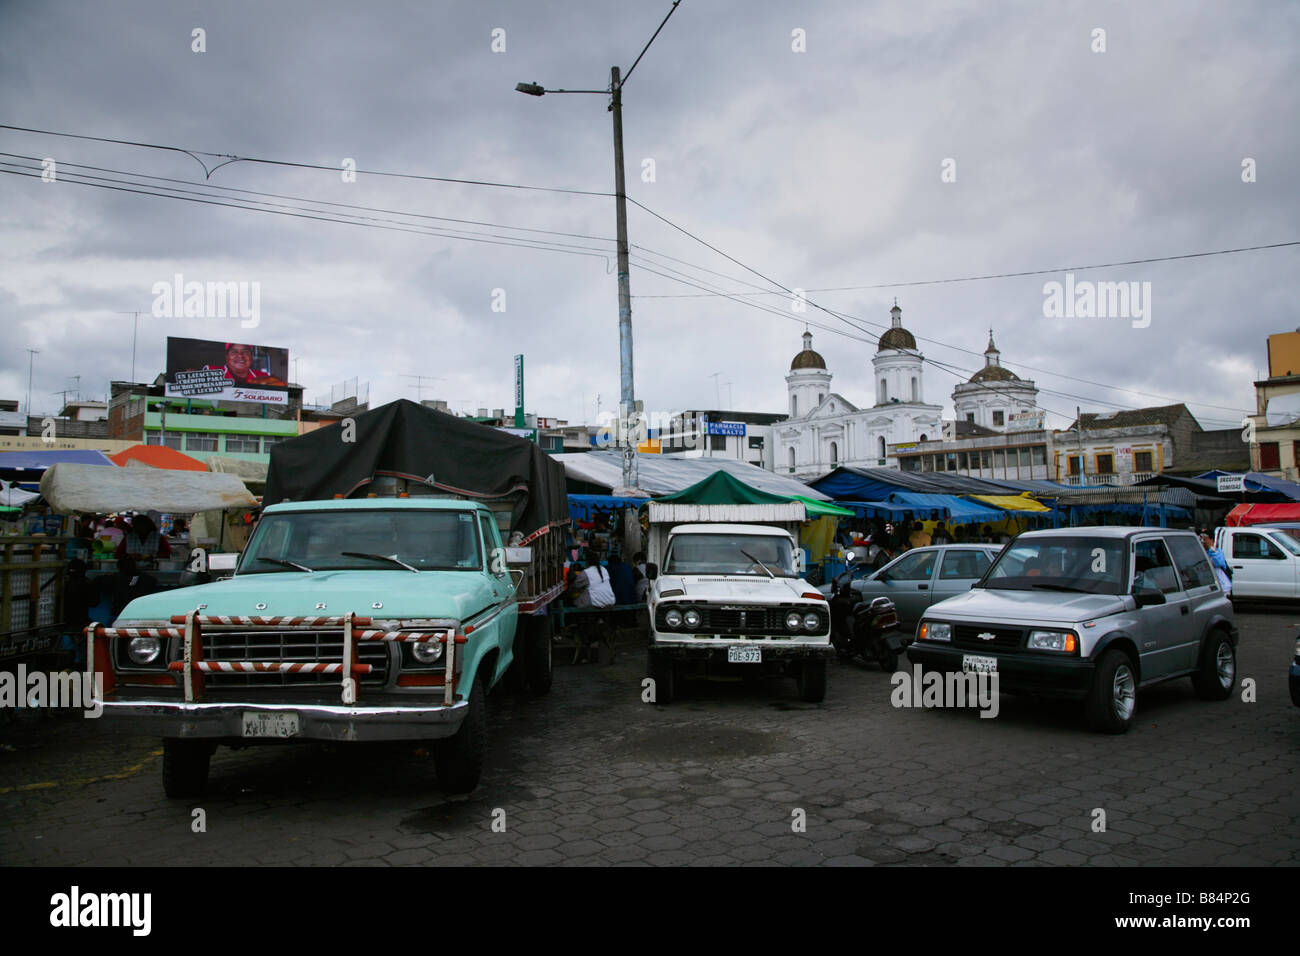 Fahrzeuge für Stellplatz aus dem Marktplatz, kämpfen Latacunga, Provinz Cotopaxi in Ecuador Stockbild